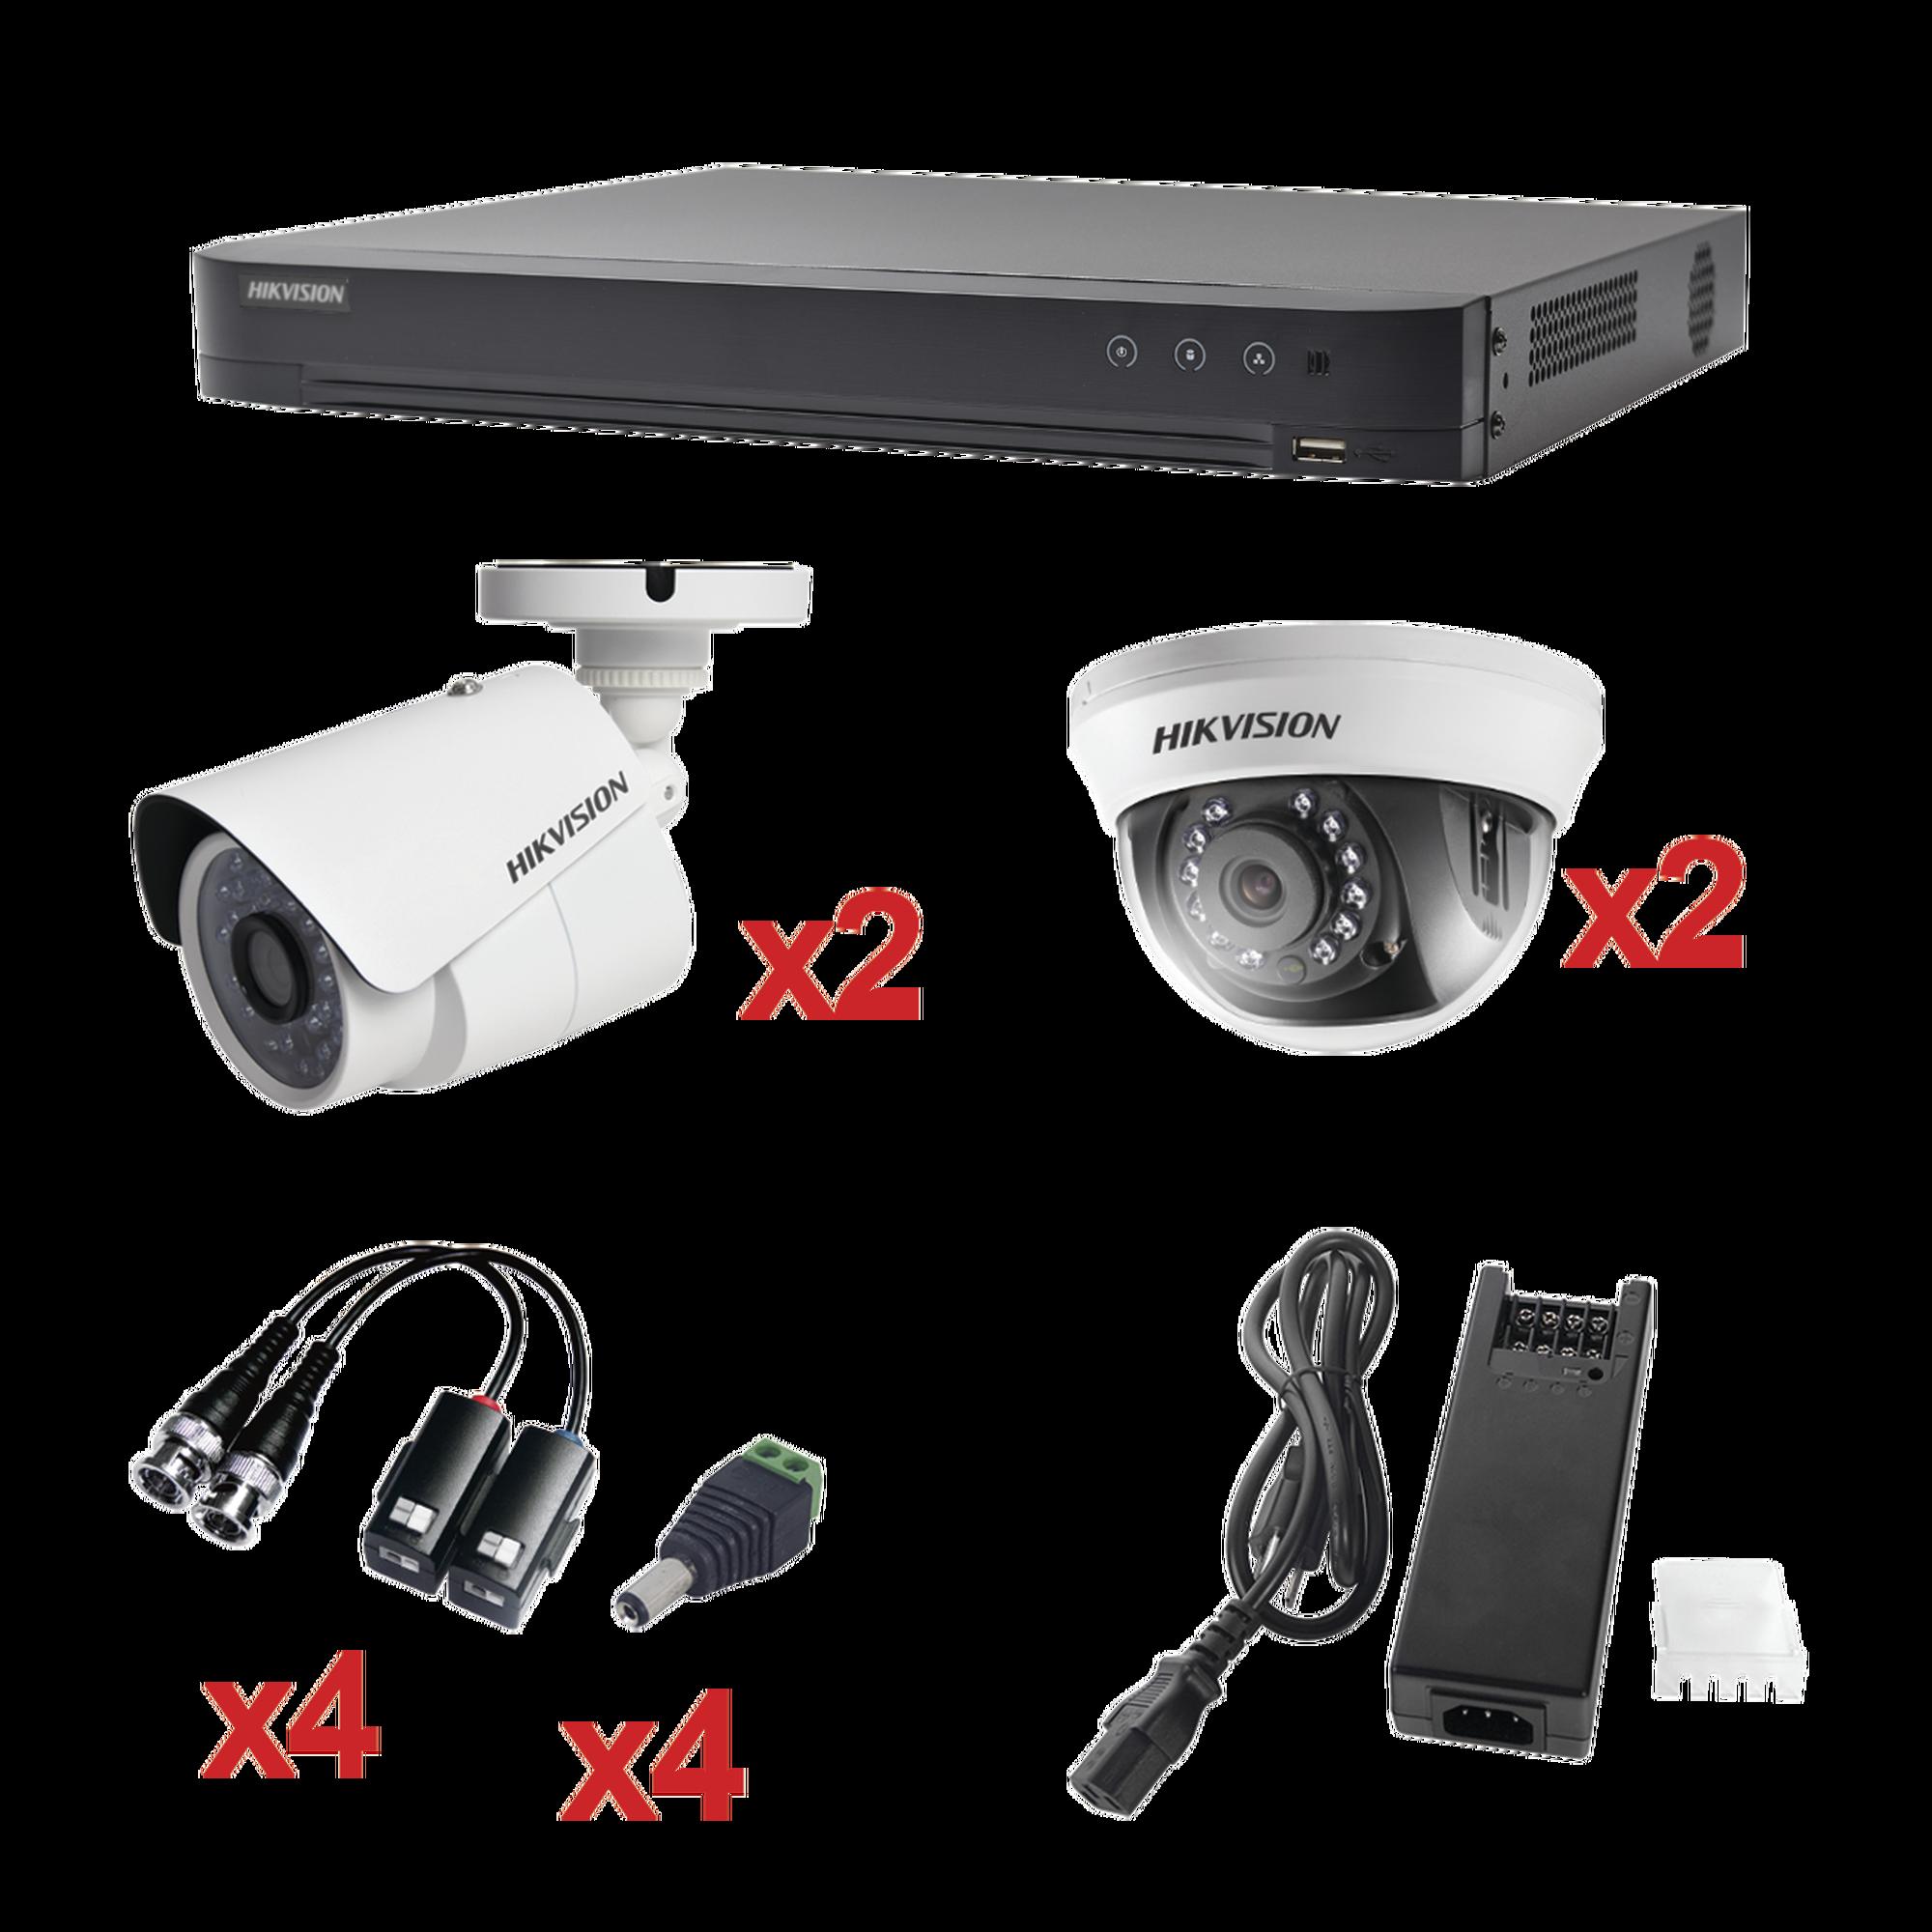 Sistema HIKVISION TURBOHD 1080p / DVR 4 Canales / 2 Cámaras Bala (exterior 2.8 mm) / 2 Cámaras Domo (interior 2.8 mm) / Transceptores / Conectores / Fuente de Poder Profesional